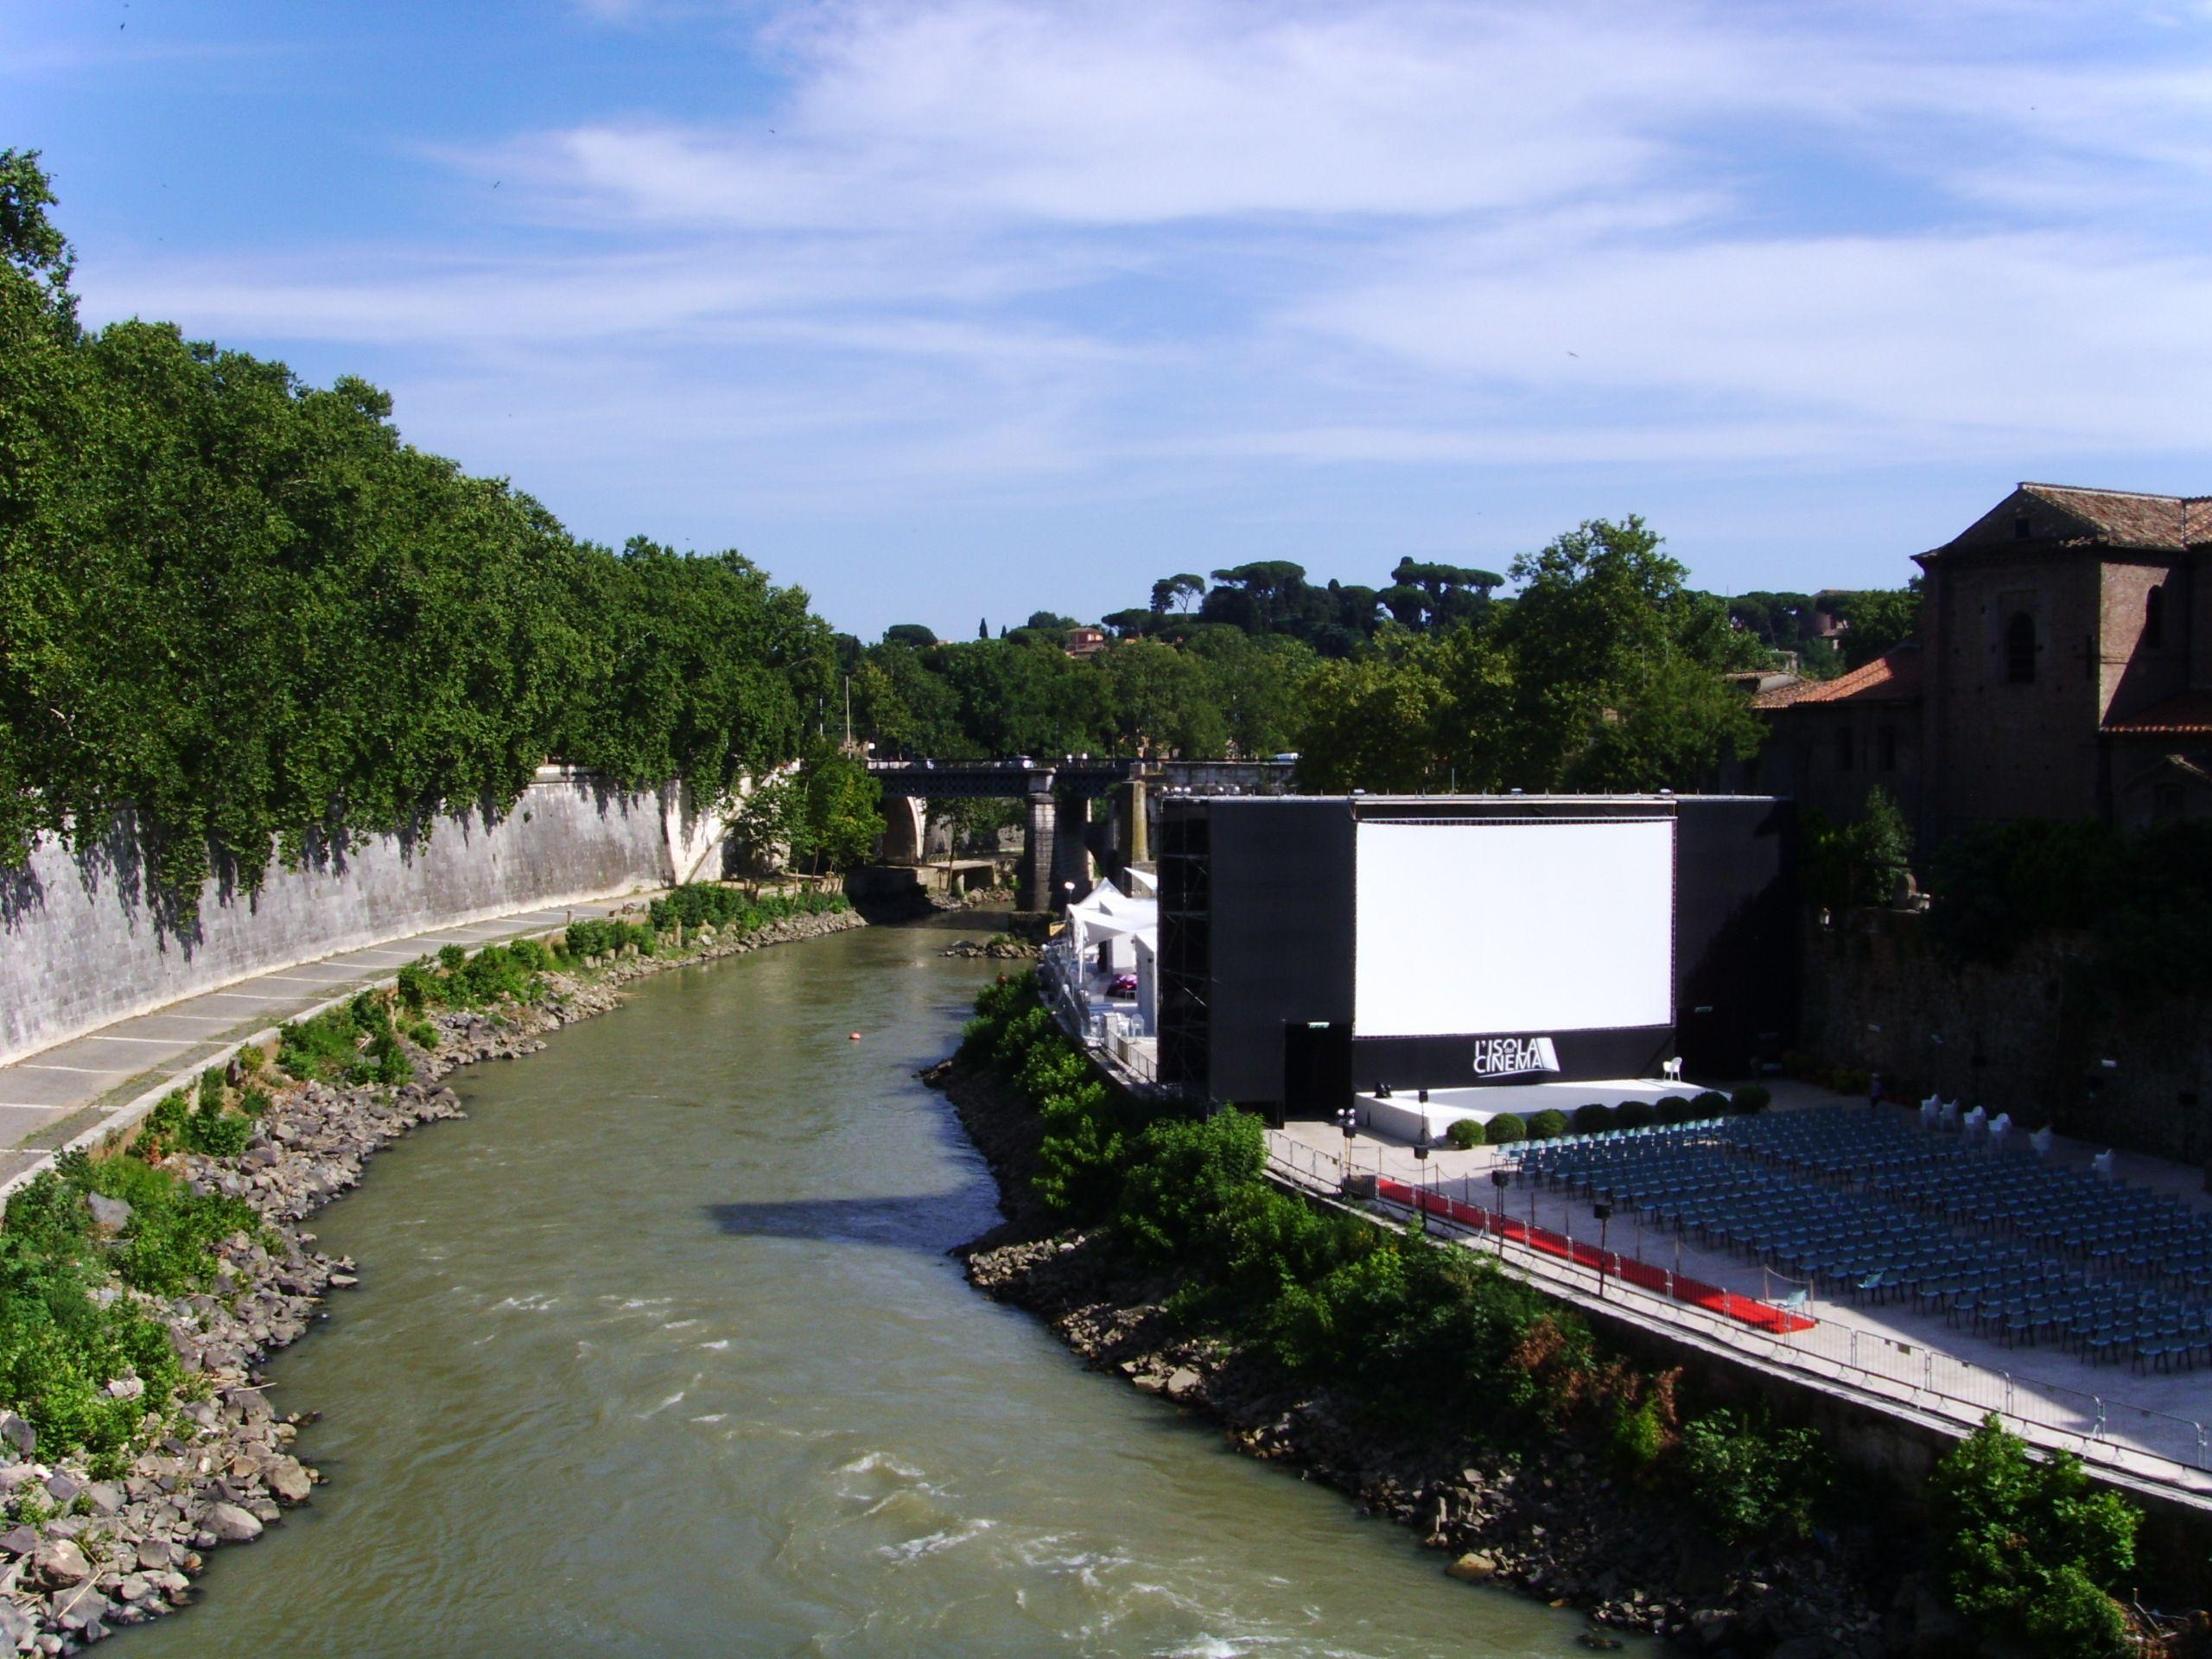 Open air cinema at Isola Tiberina Rome, by Açalya